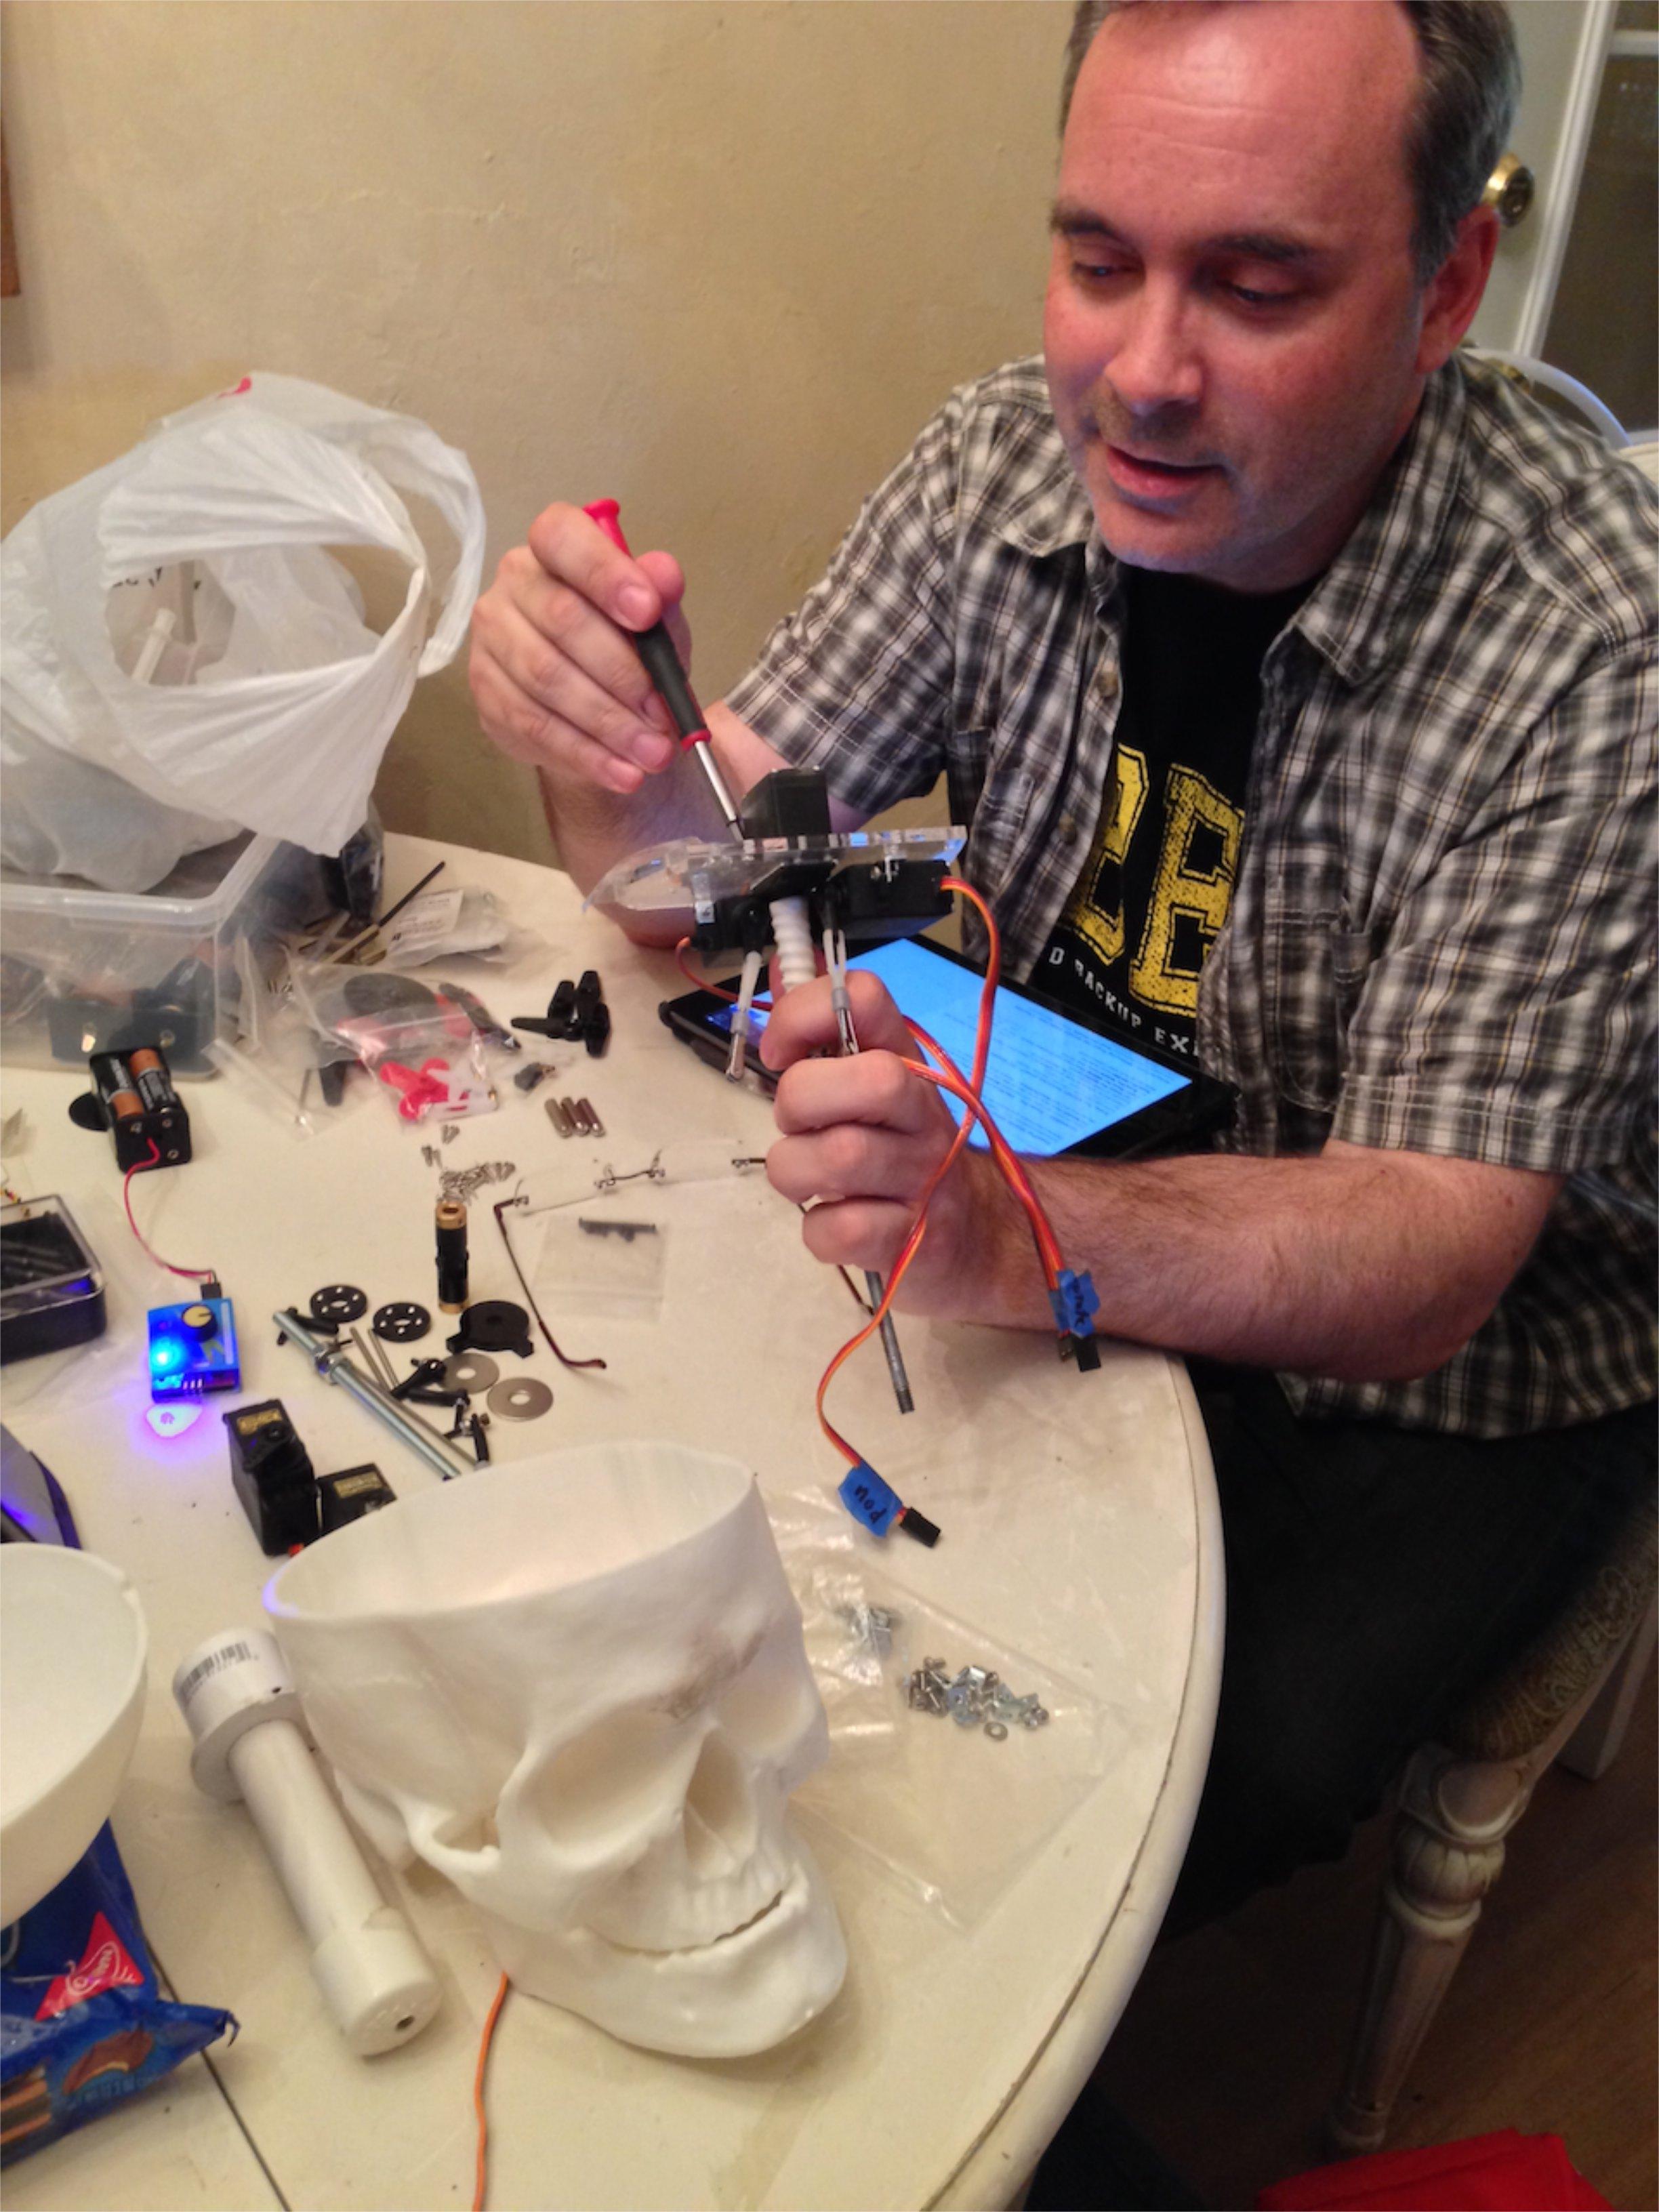 Ghoulish Glen testing & assembling animatronic skull kits